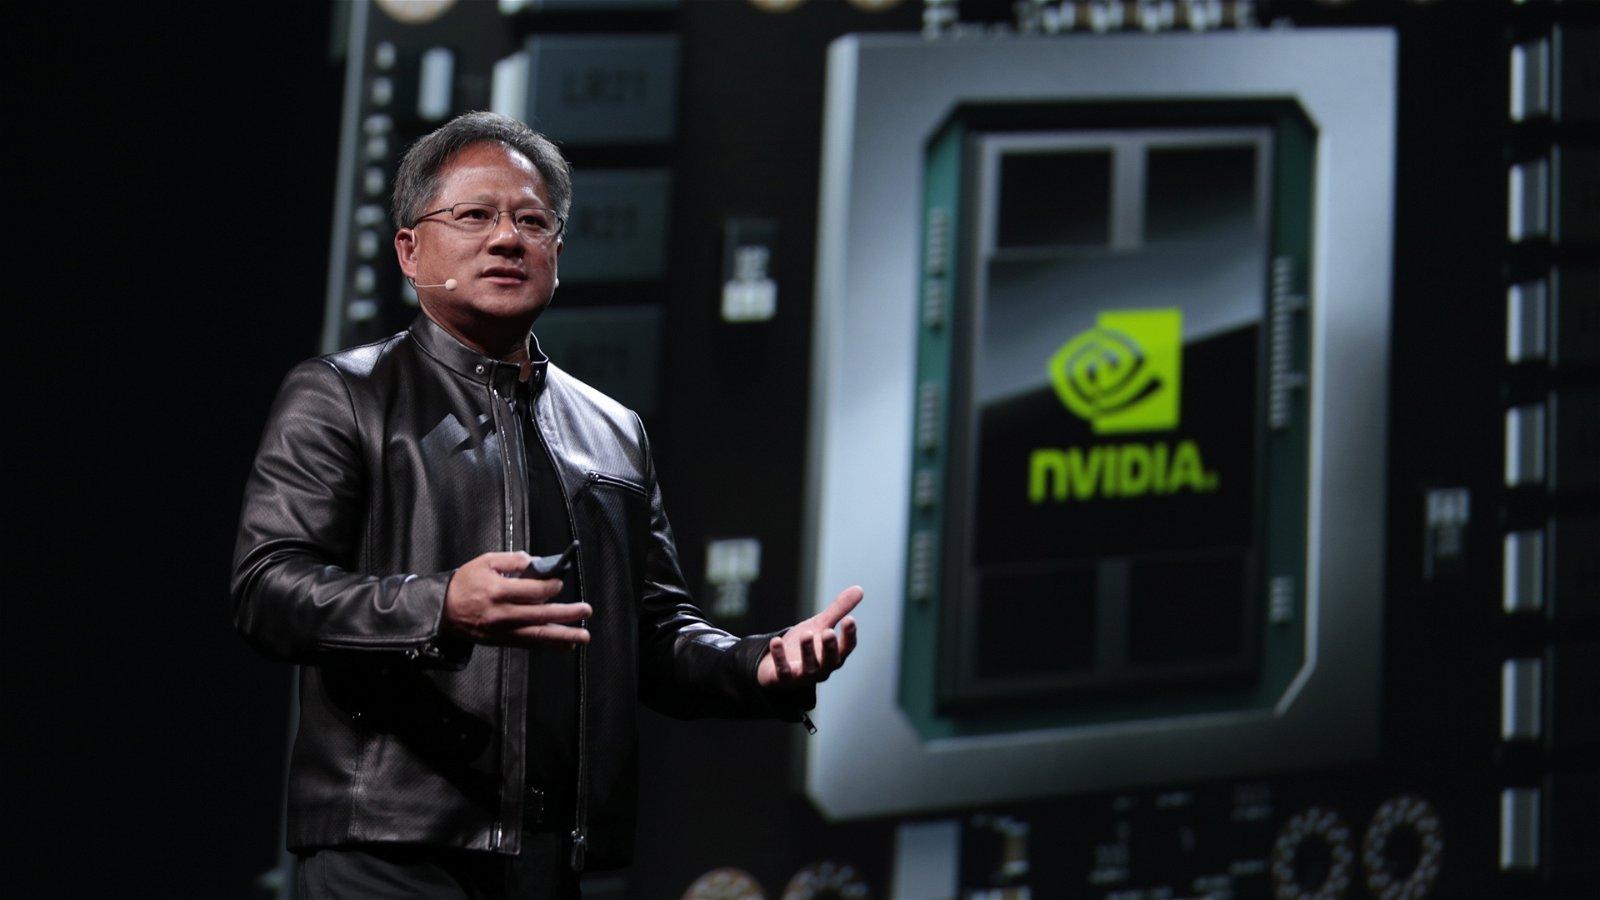 Nvidia Showcases Quadro RTX GPU, World's First Ray Tracing Capable GPU